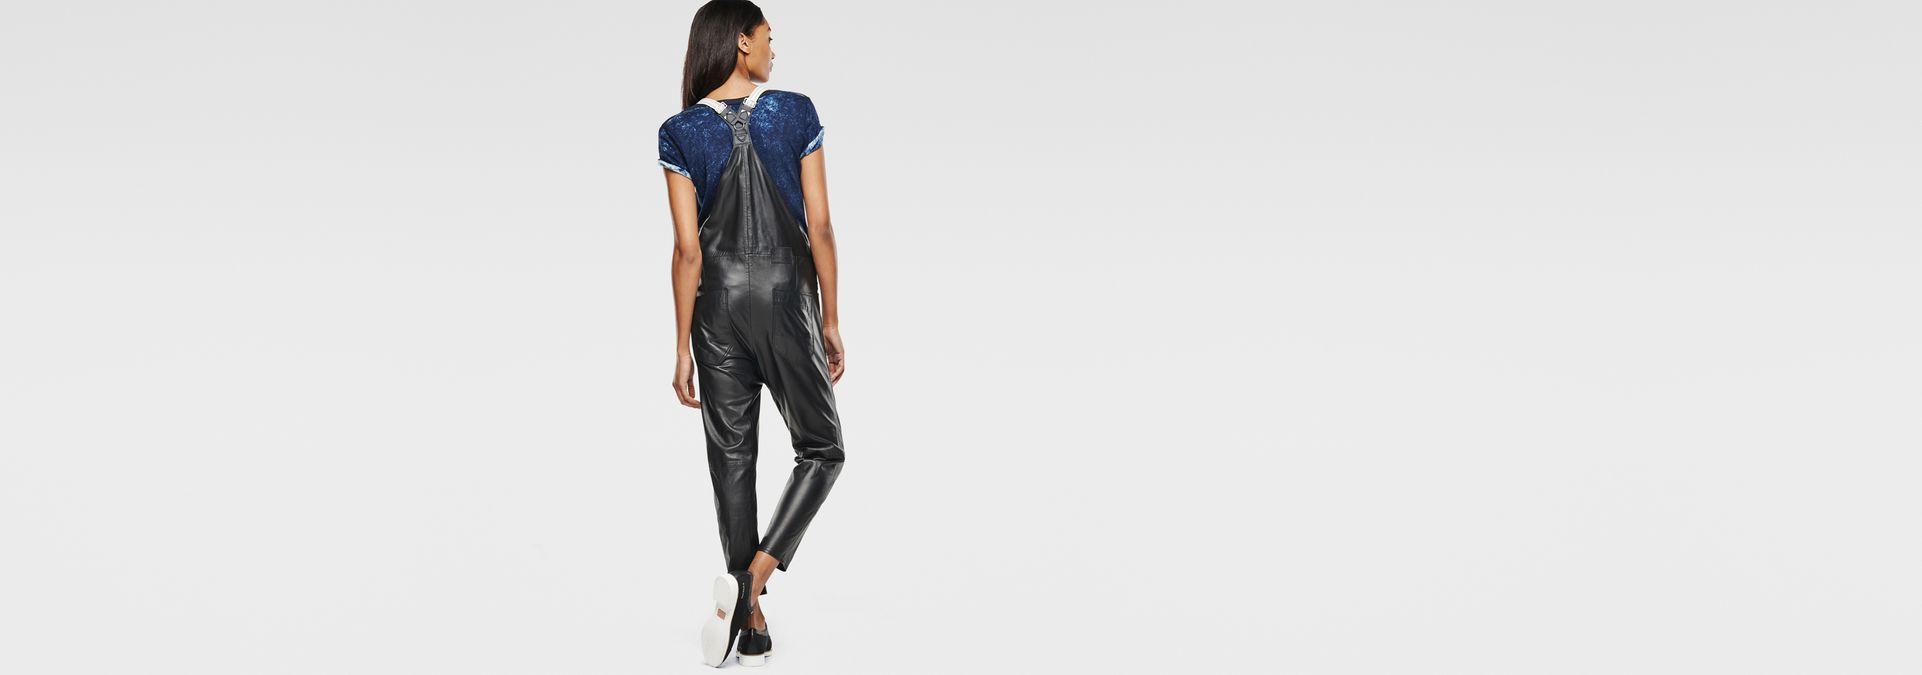 ... G-Star RAW® Type C Leather Salopette Black model back zoom ...